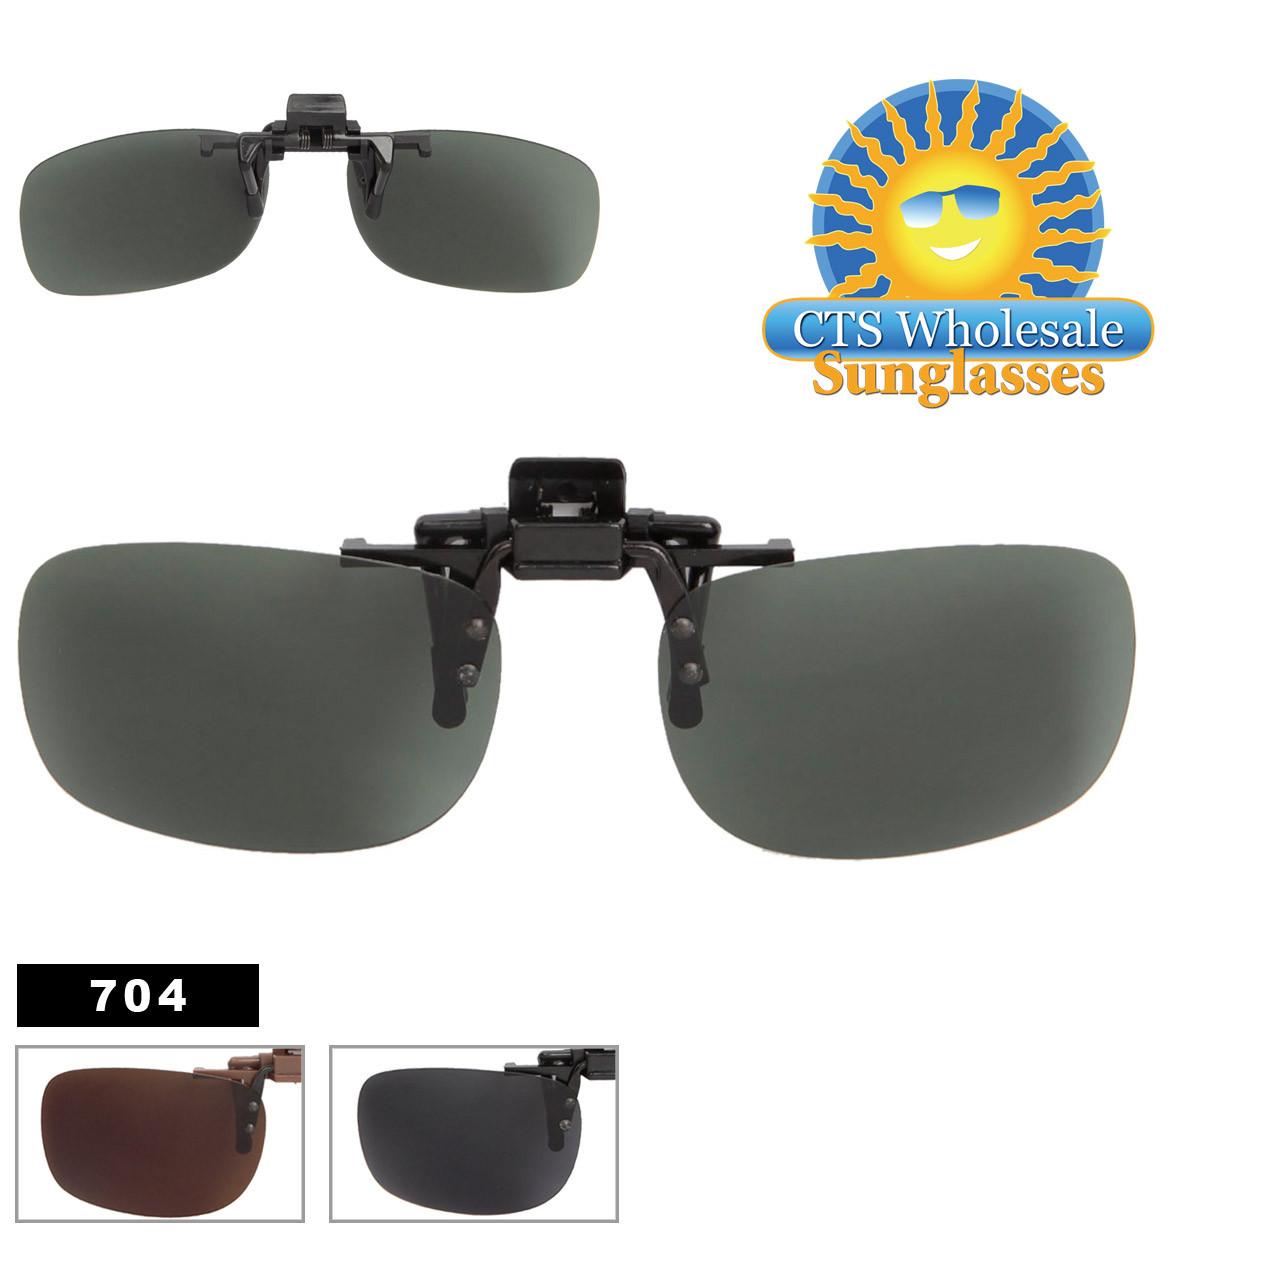 Polarized Wholesale Sunglass Clip Ons 704